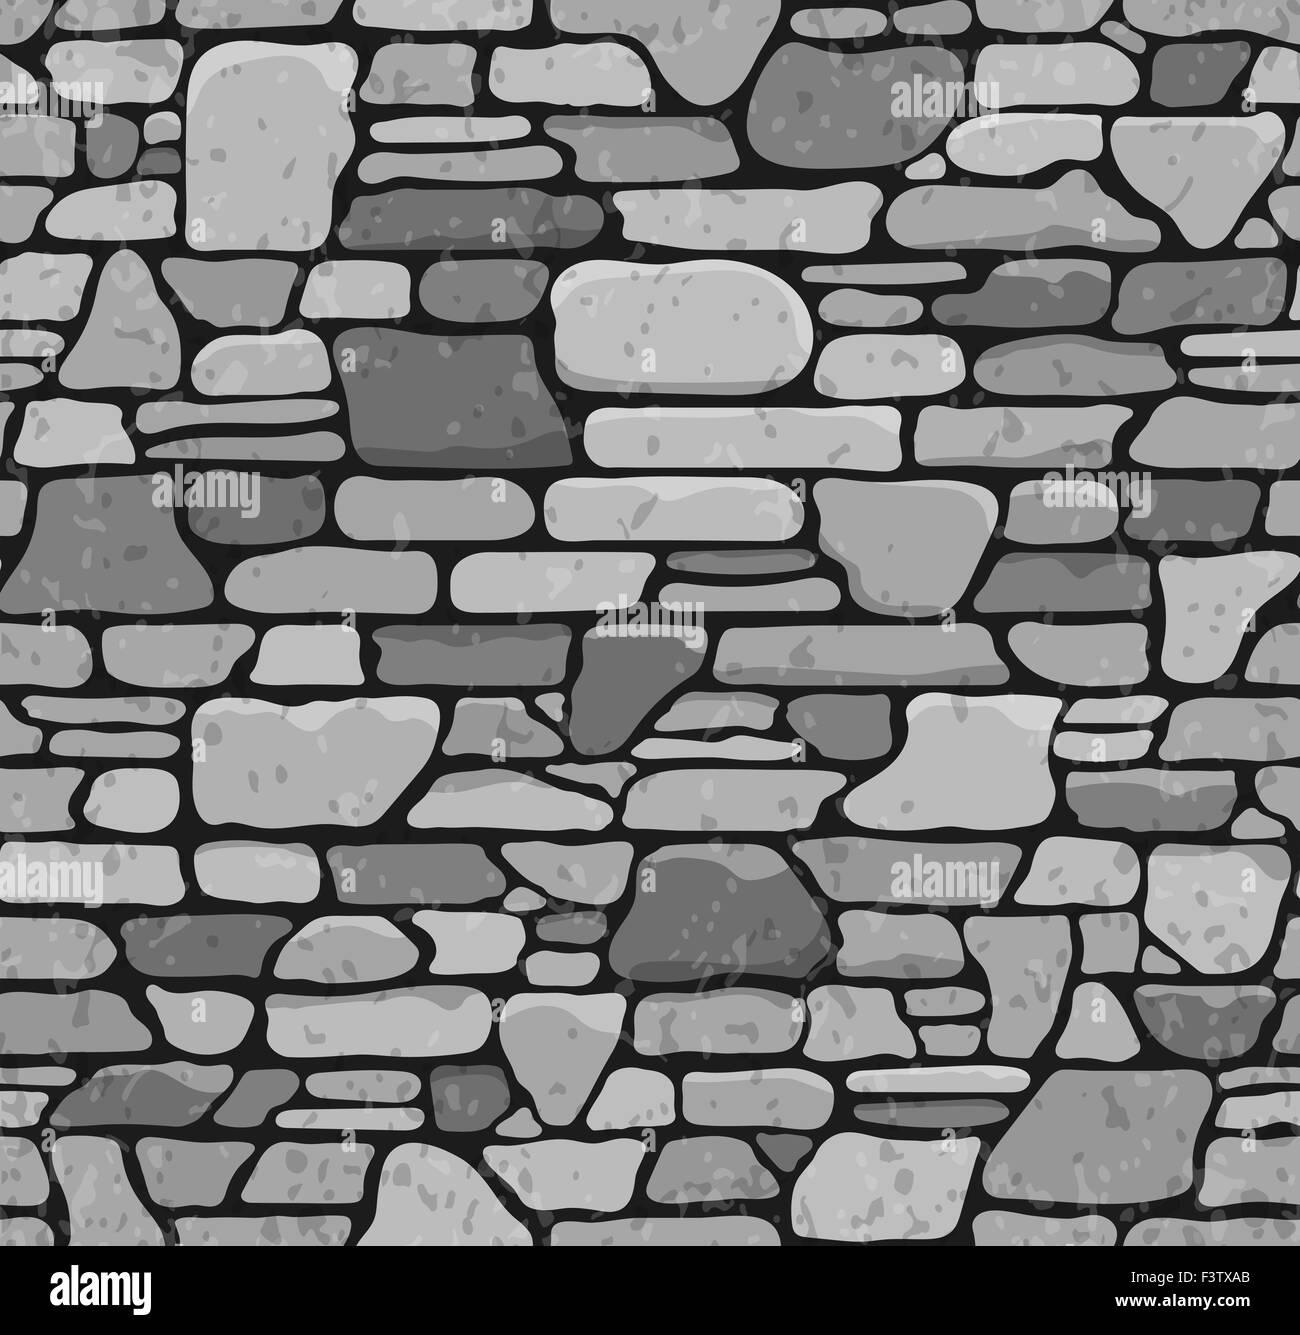 . Seamless Grunge Stone Brick Wall Texture  Illustration Stock Photo